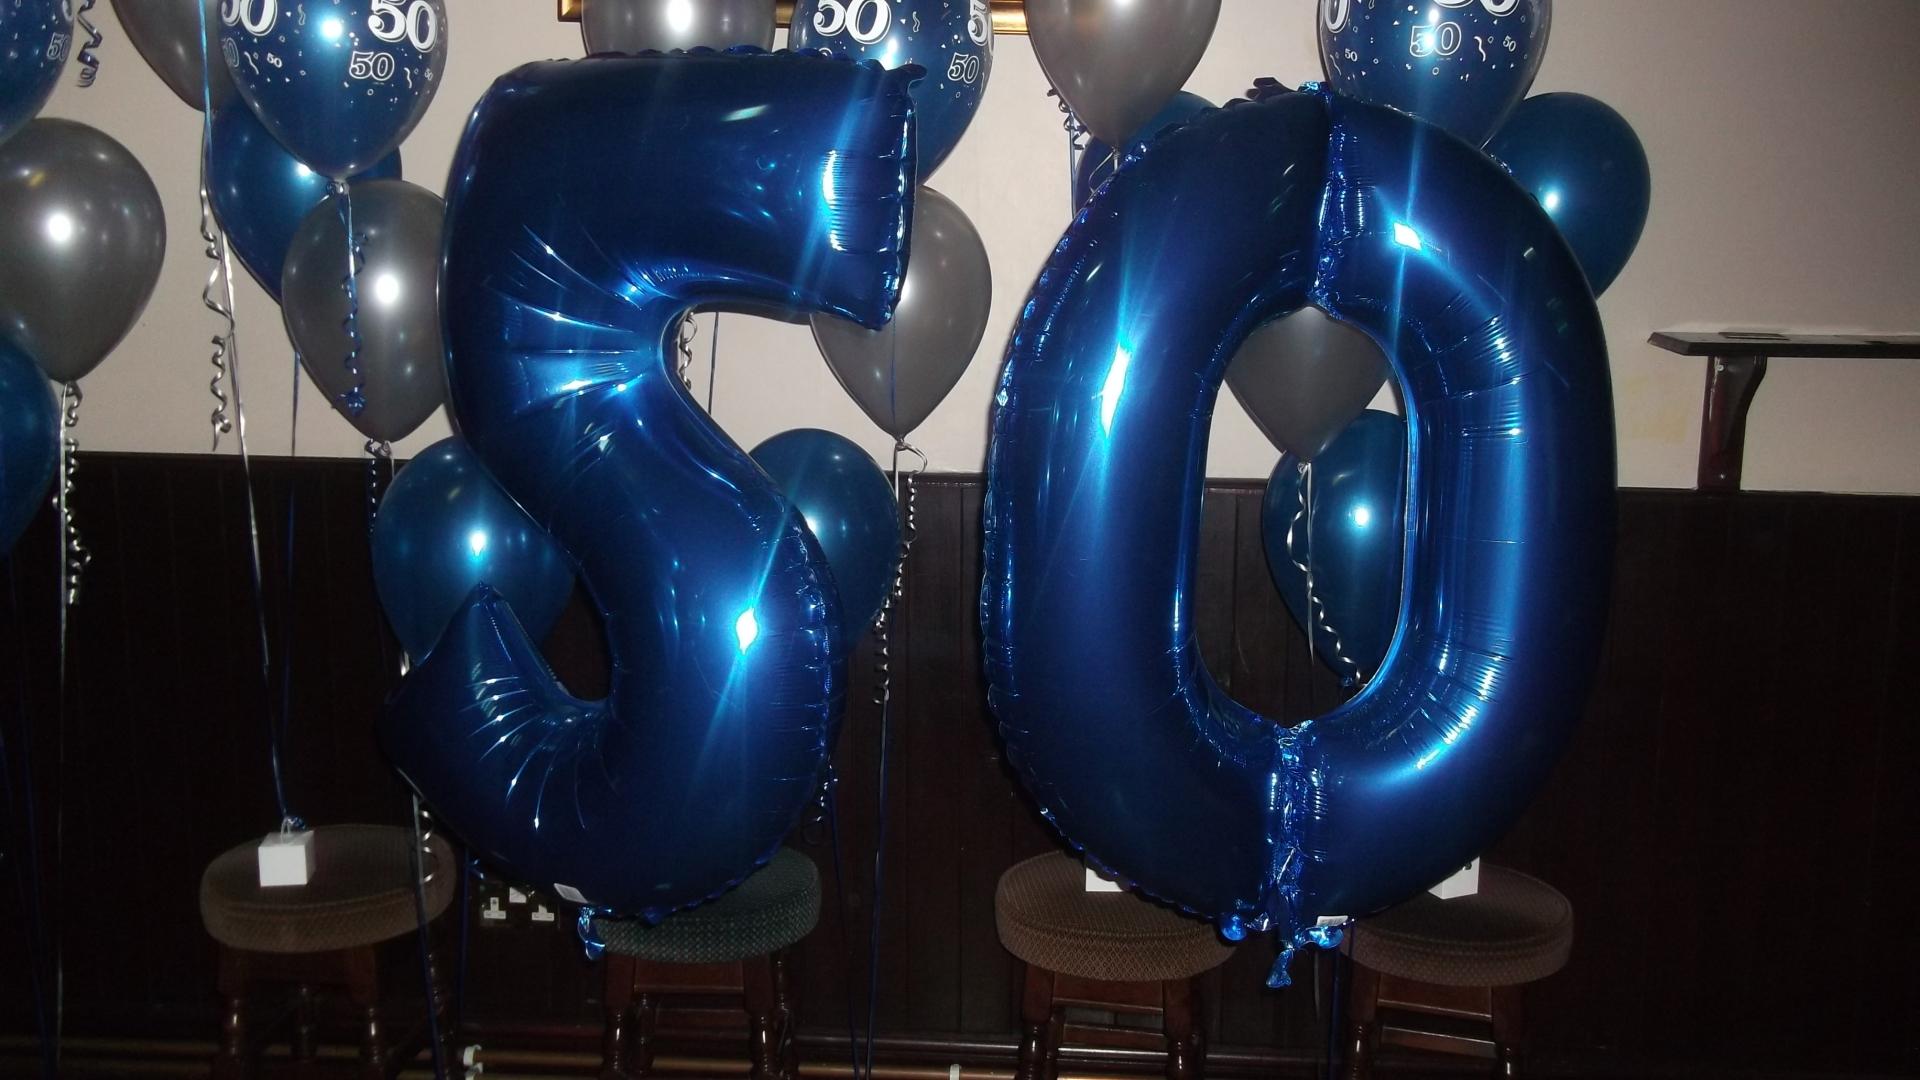 Blue Foil Number Balloon 50